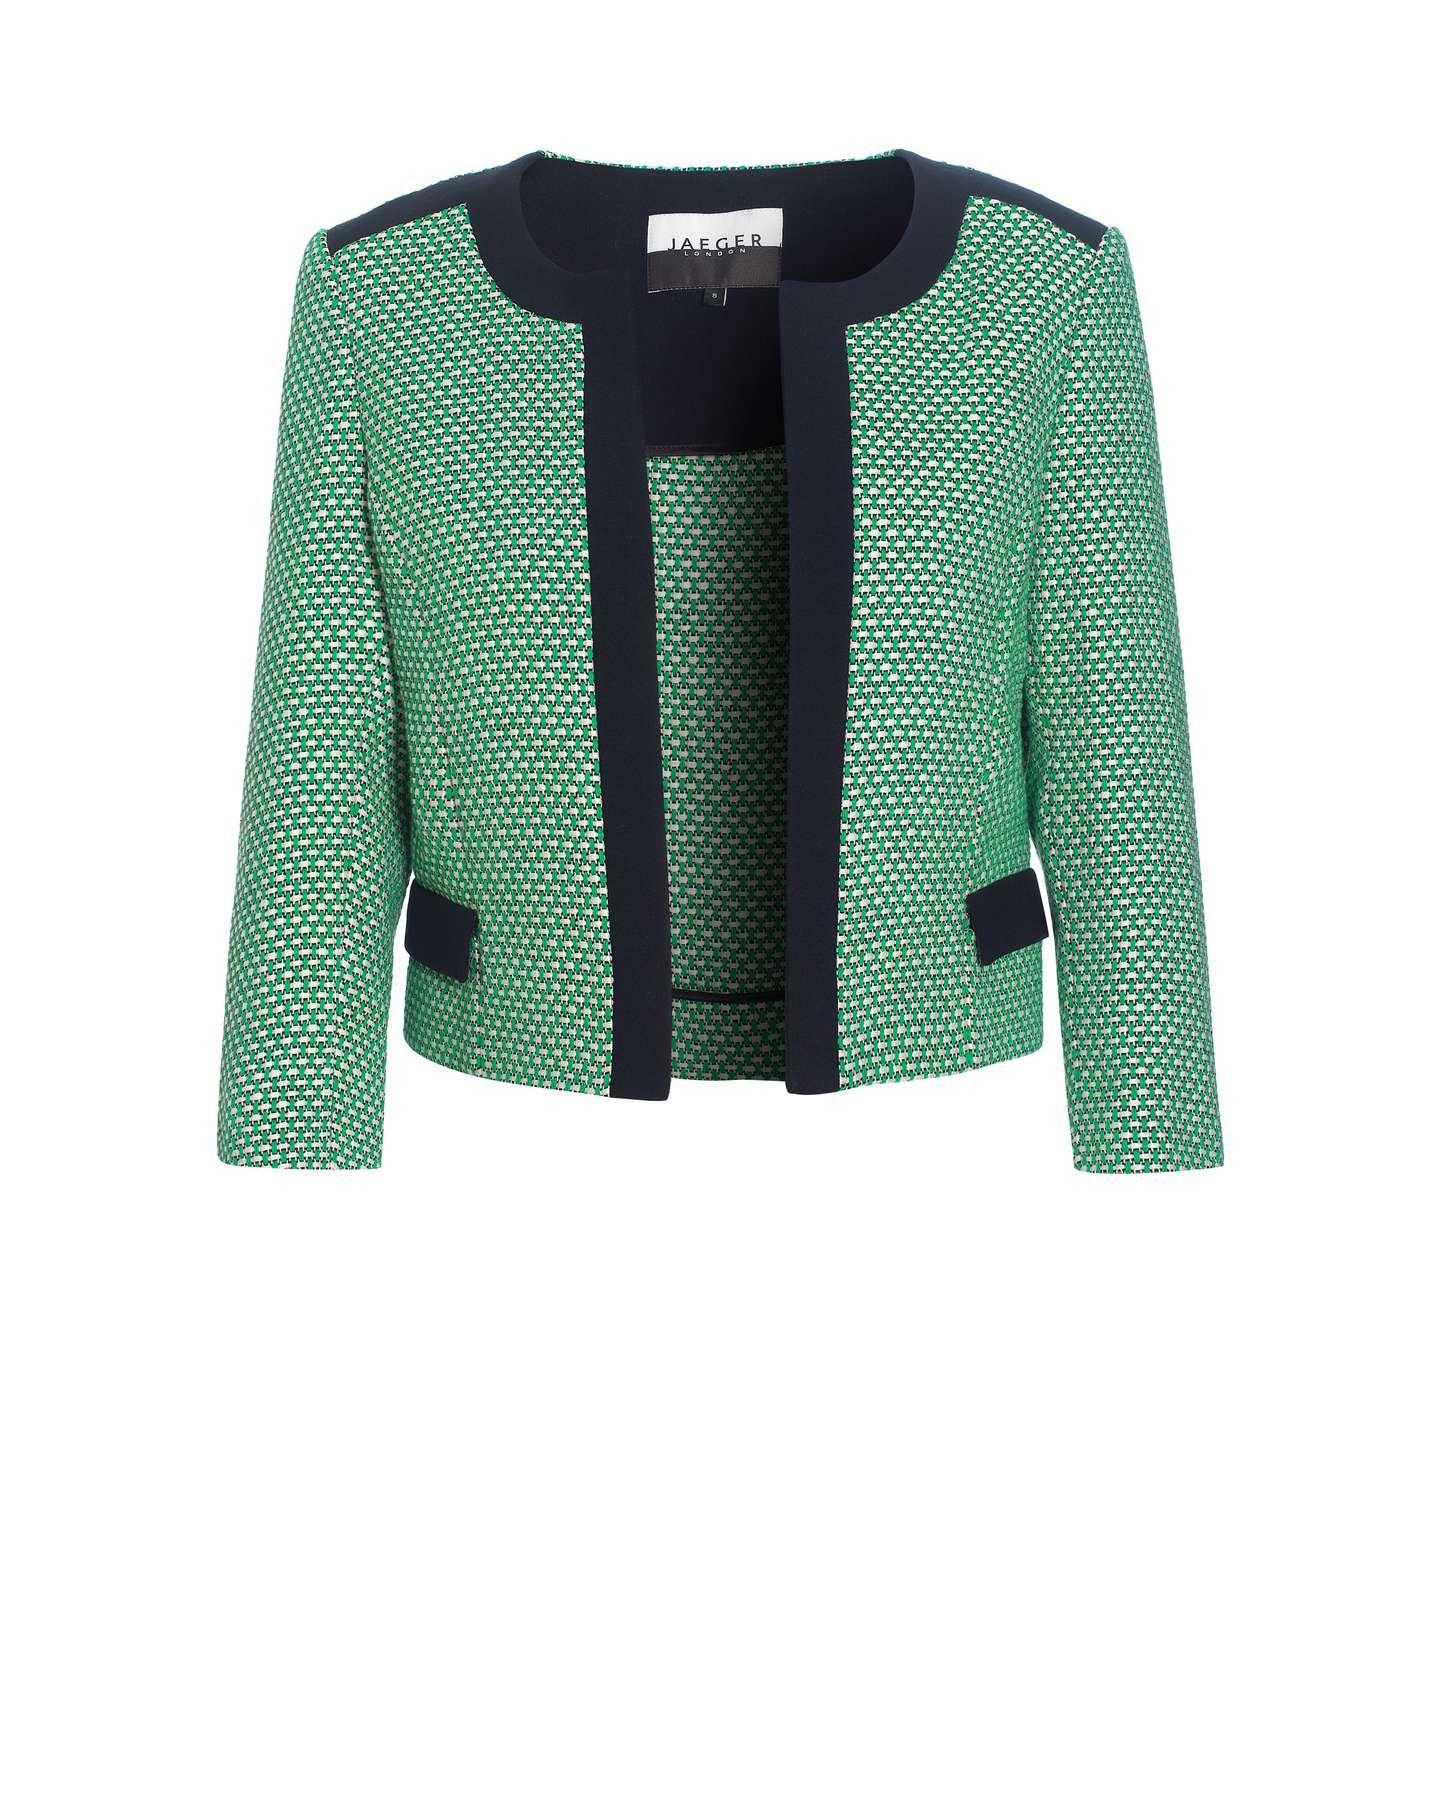 Jaeger Cropped Tweed Jacket Blazer jackets for women